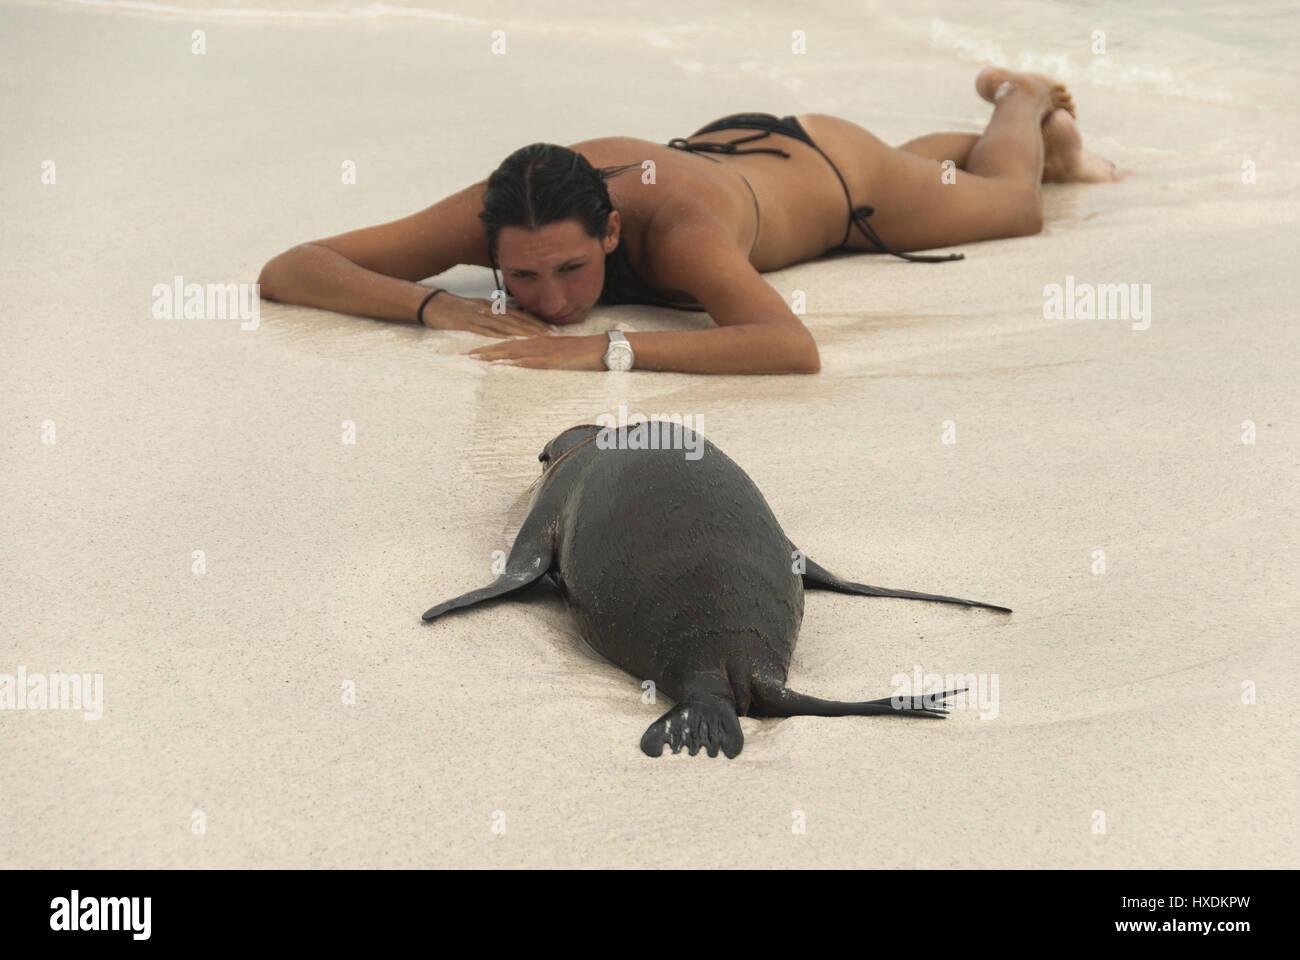 Ecuador, Galapagos, Espanola island, Gardner Bay, Sea lion pup and visitor on beach - Stock Image